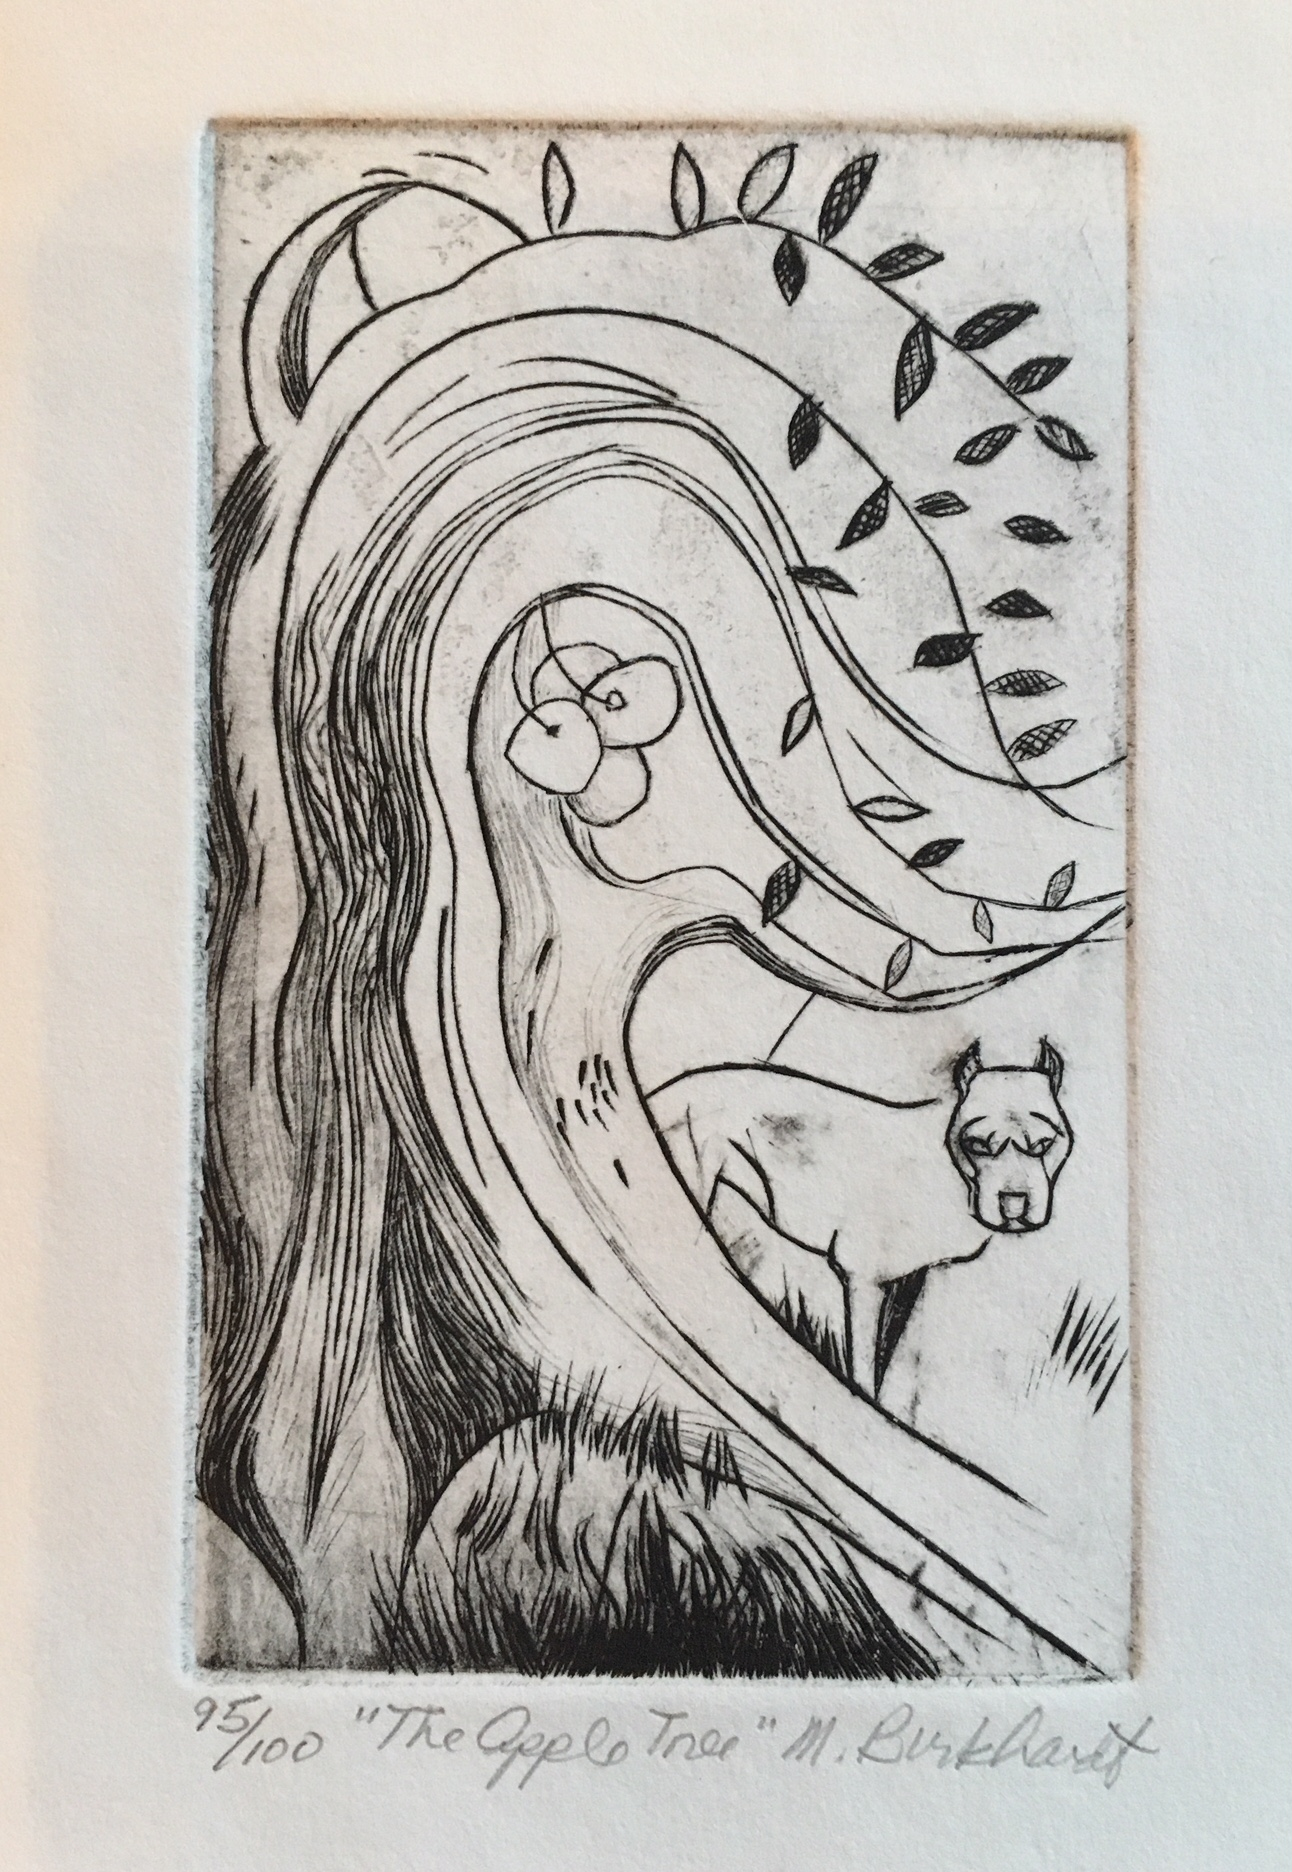 Marilyn Burkhardt, The Apple Tree, engraving